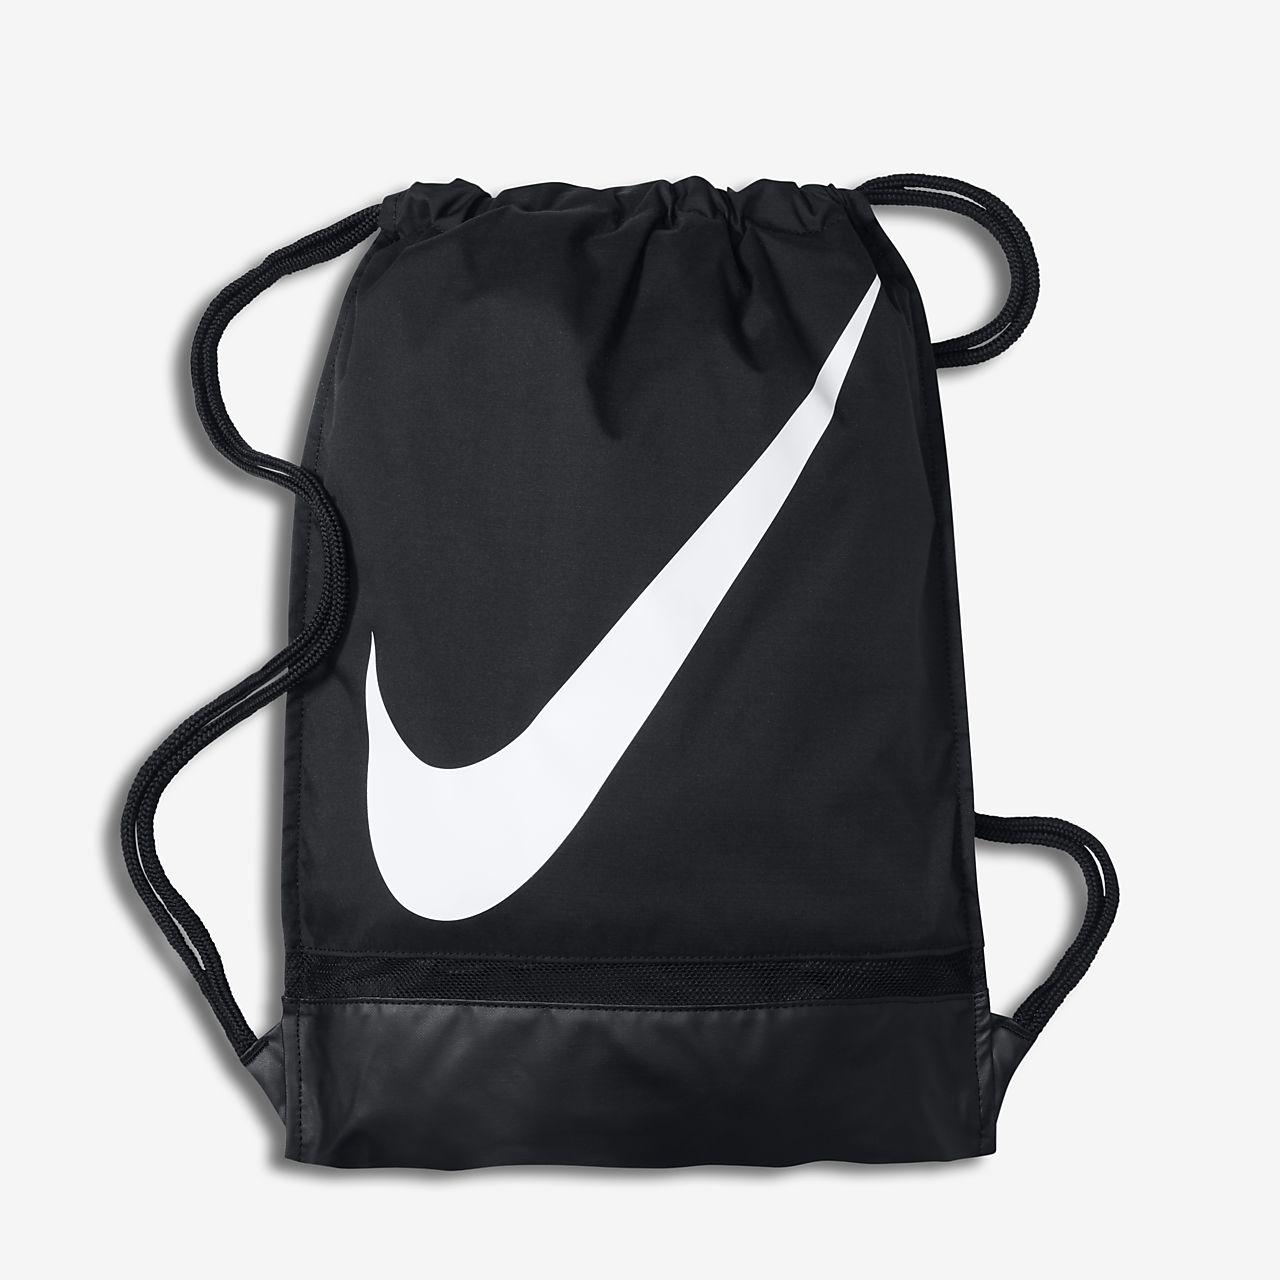 Nike Gimnasio SoccerCl Bolso Bolso Nike Bolso Para Gimnasio Para SoccerCl 5LcjqA34R